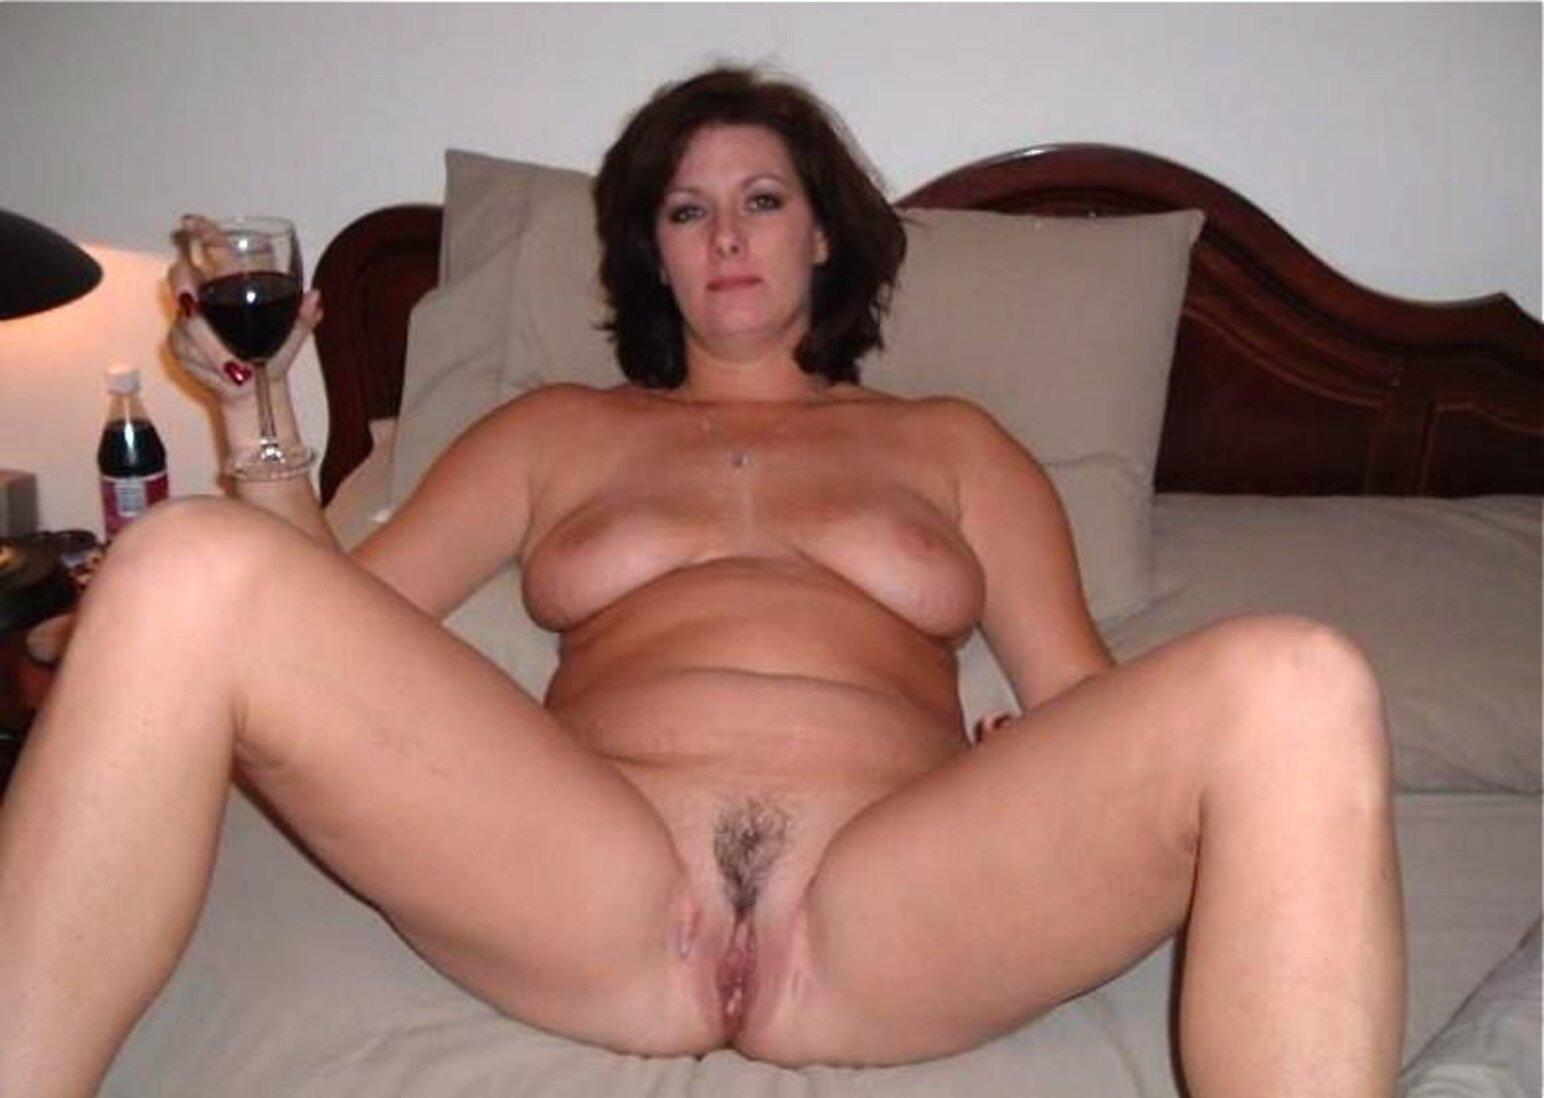 Тетки за 40 с бокалом вина лежит на кровати раздвинув ноги.